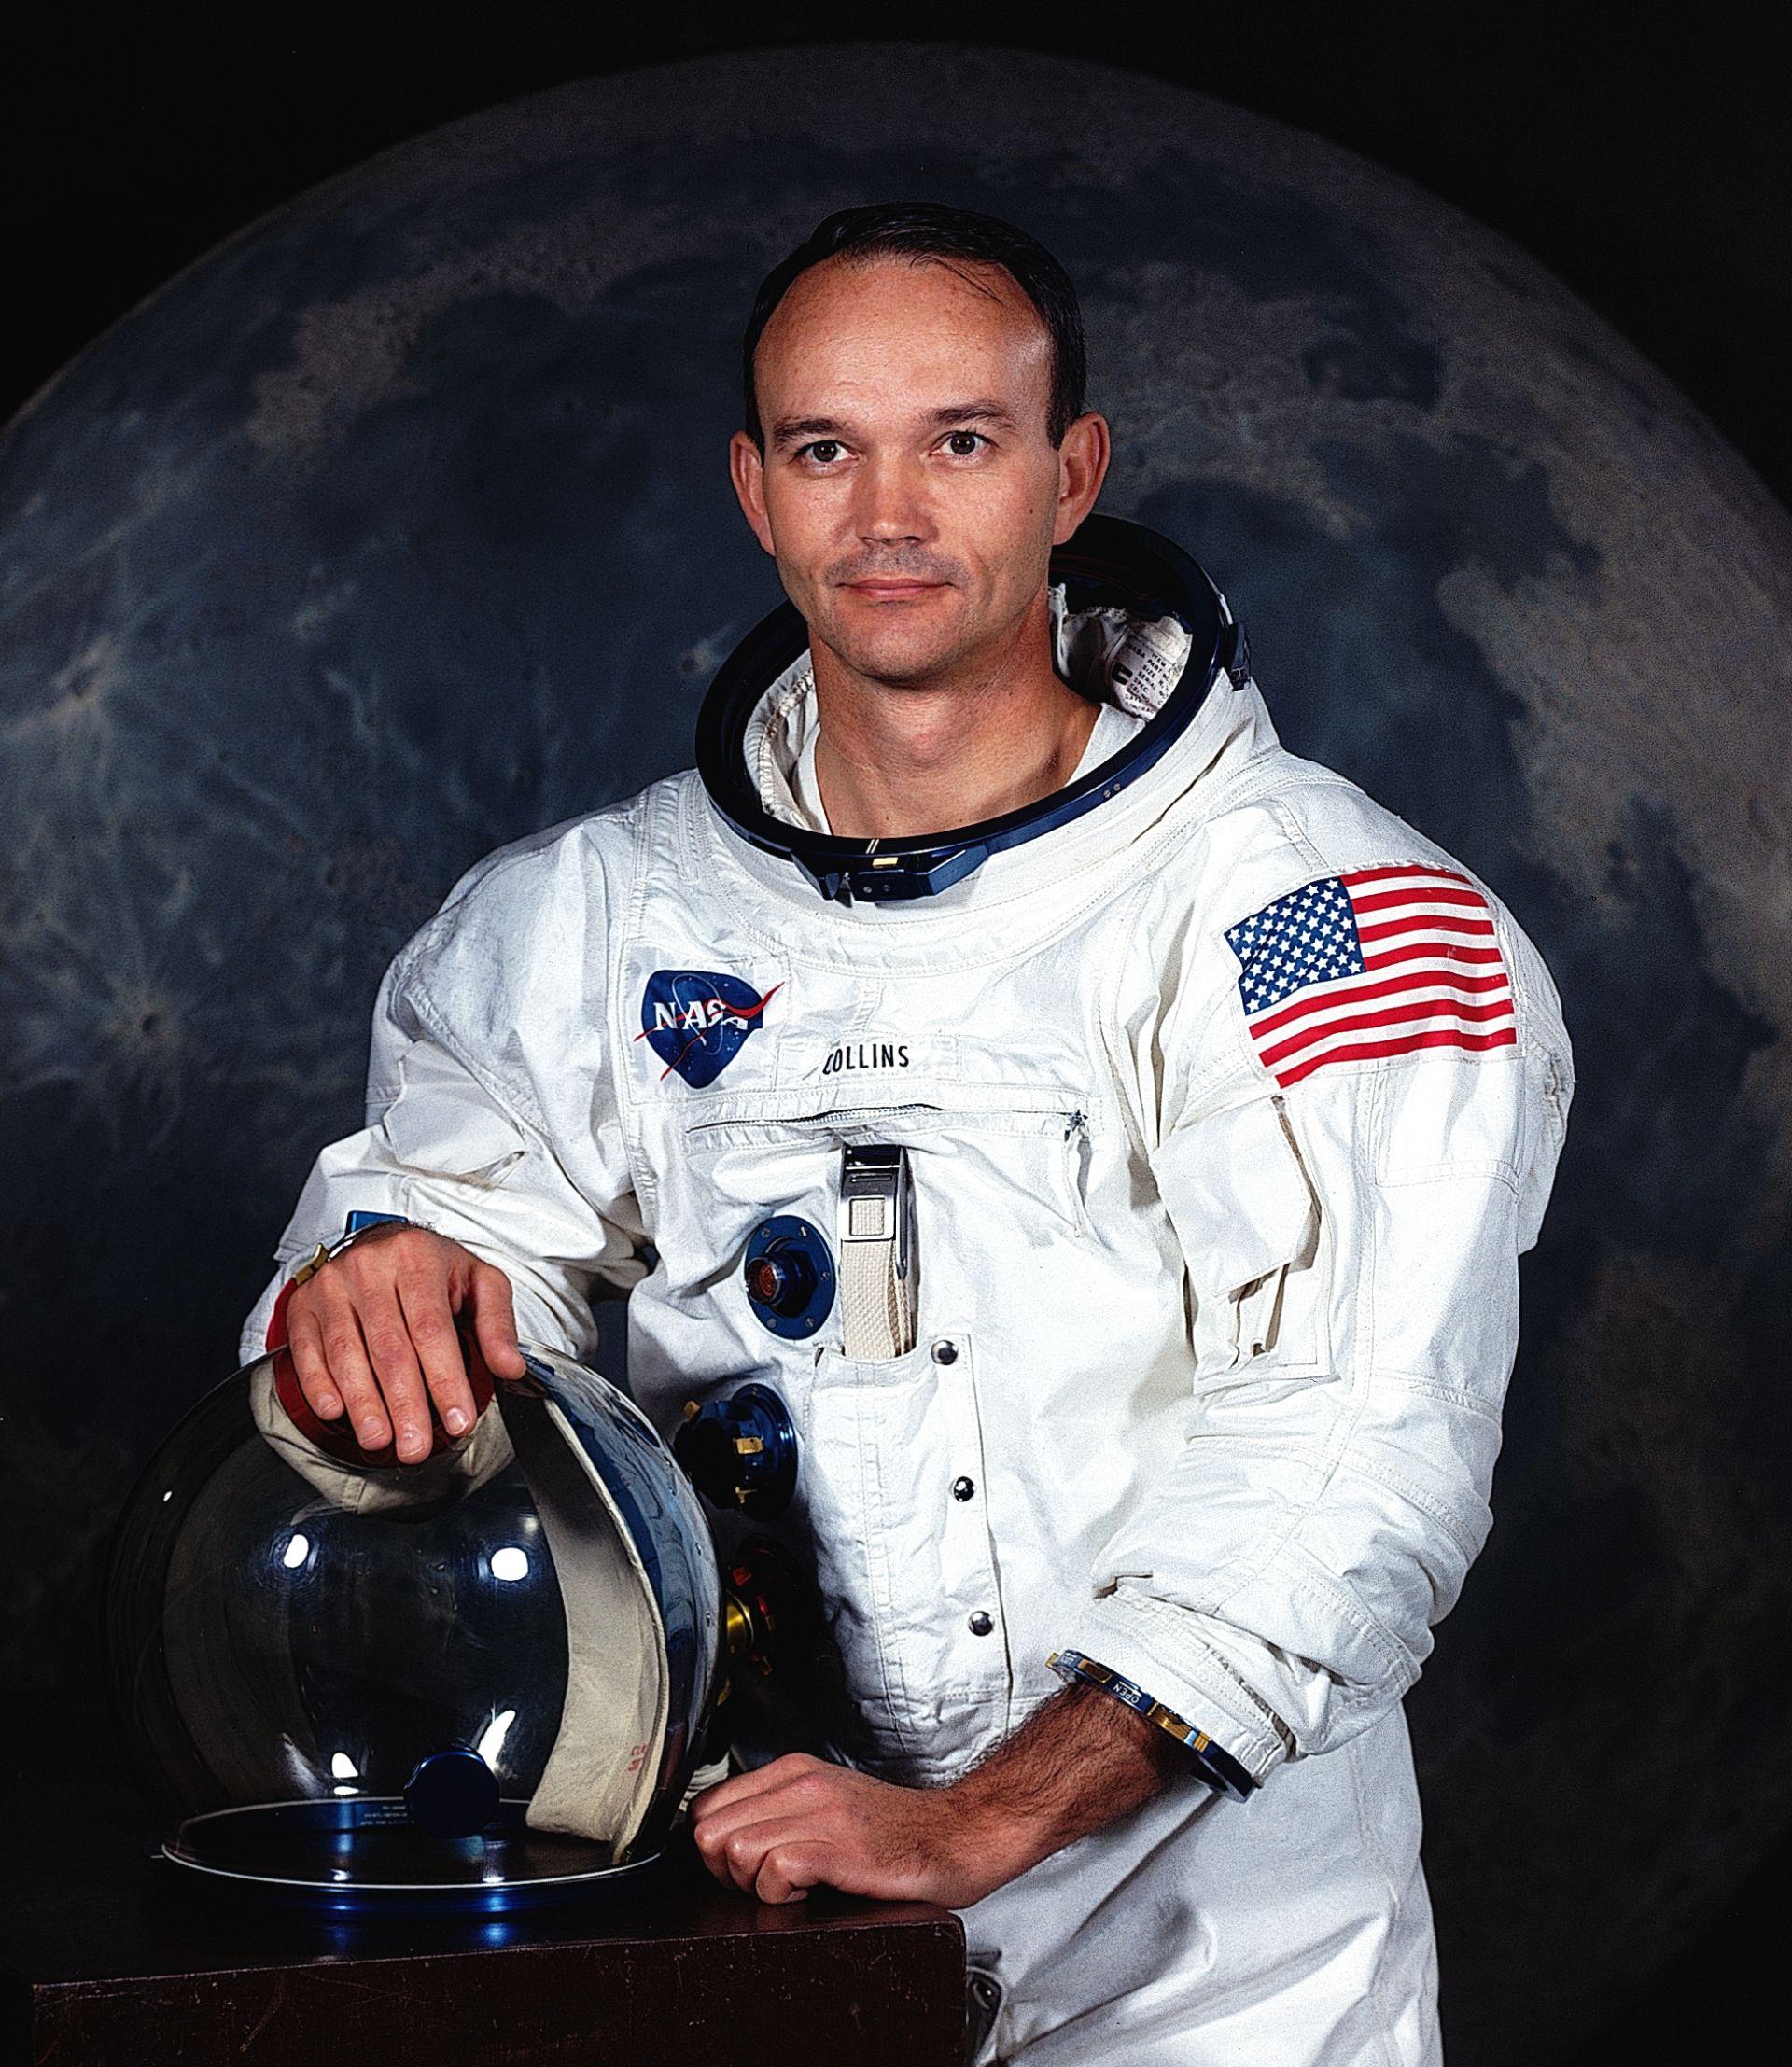 apollo 11 space mission mike - photo #10